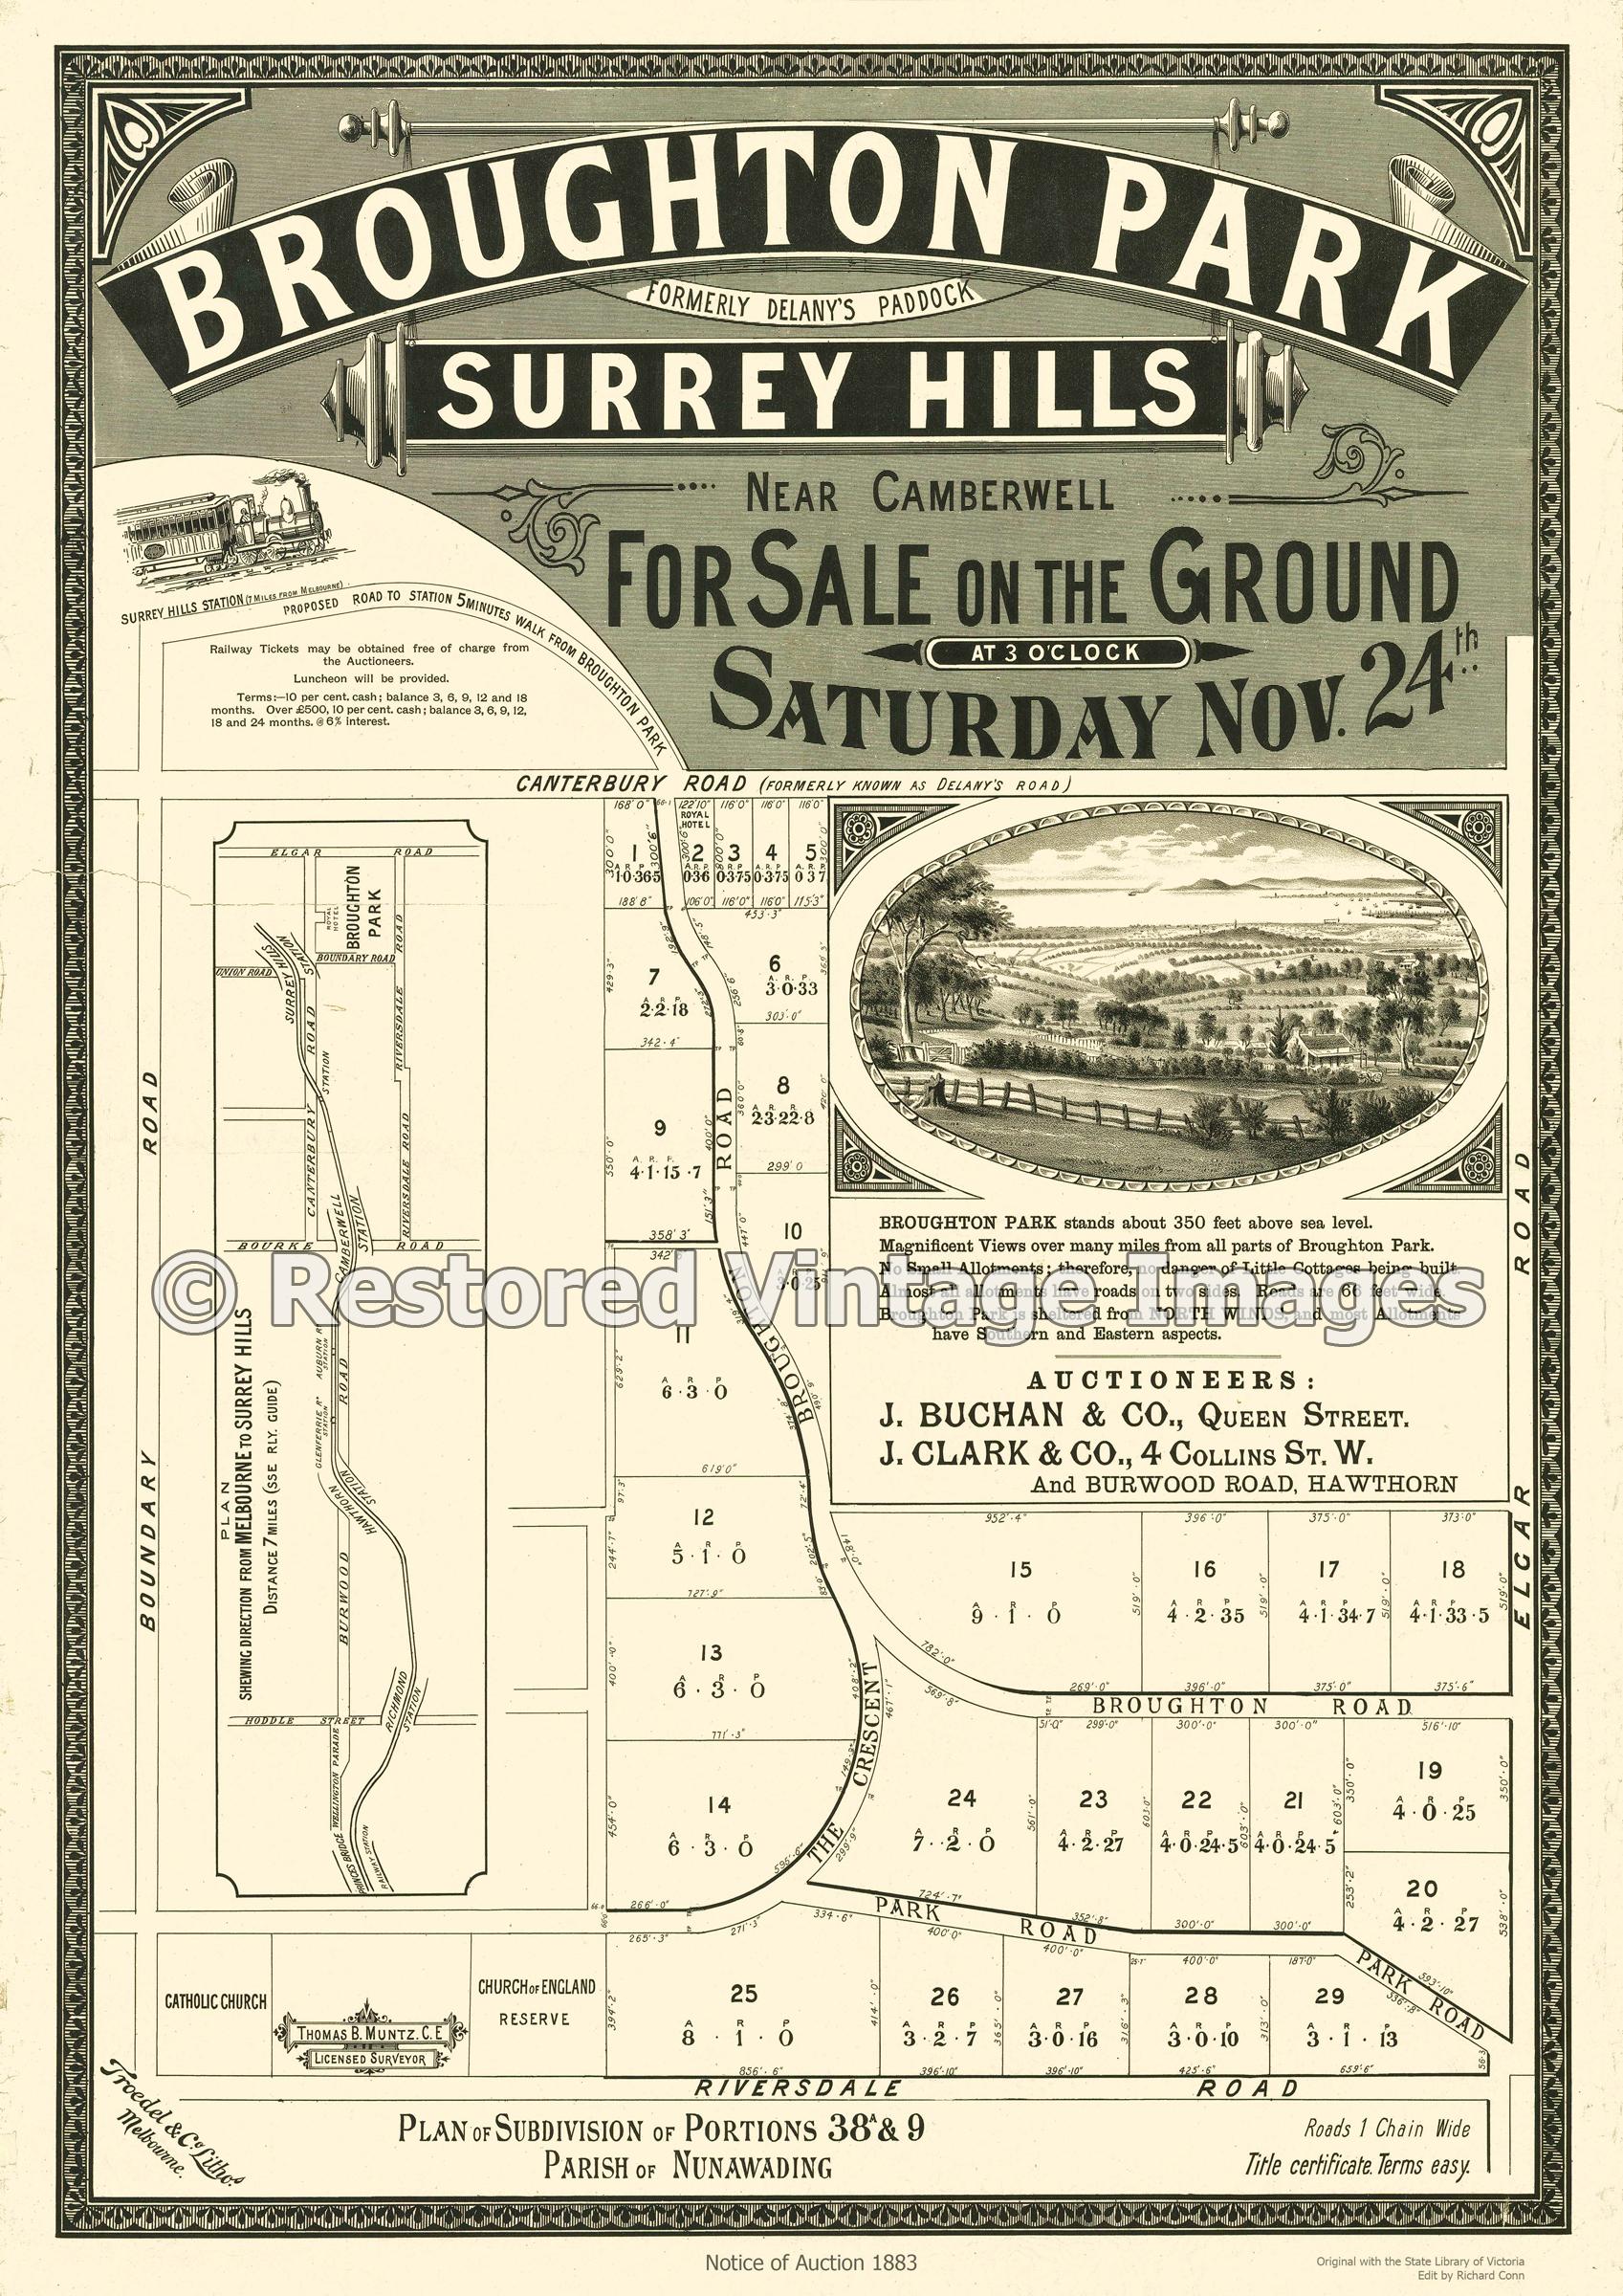 Broughton Park 1883 – Surrey Hills